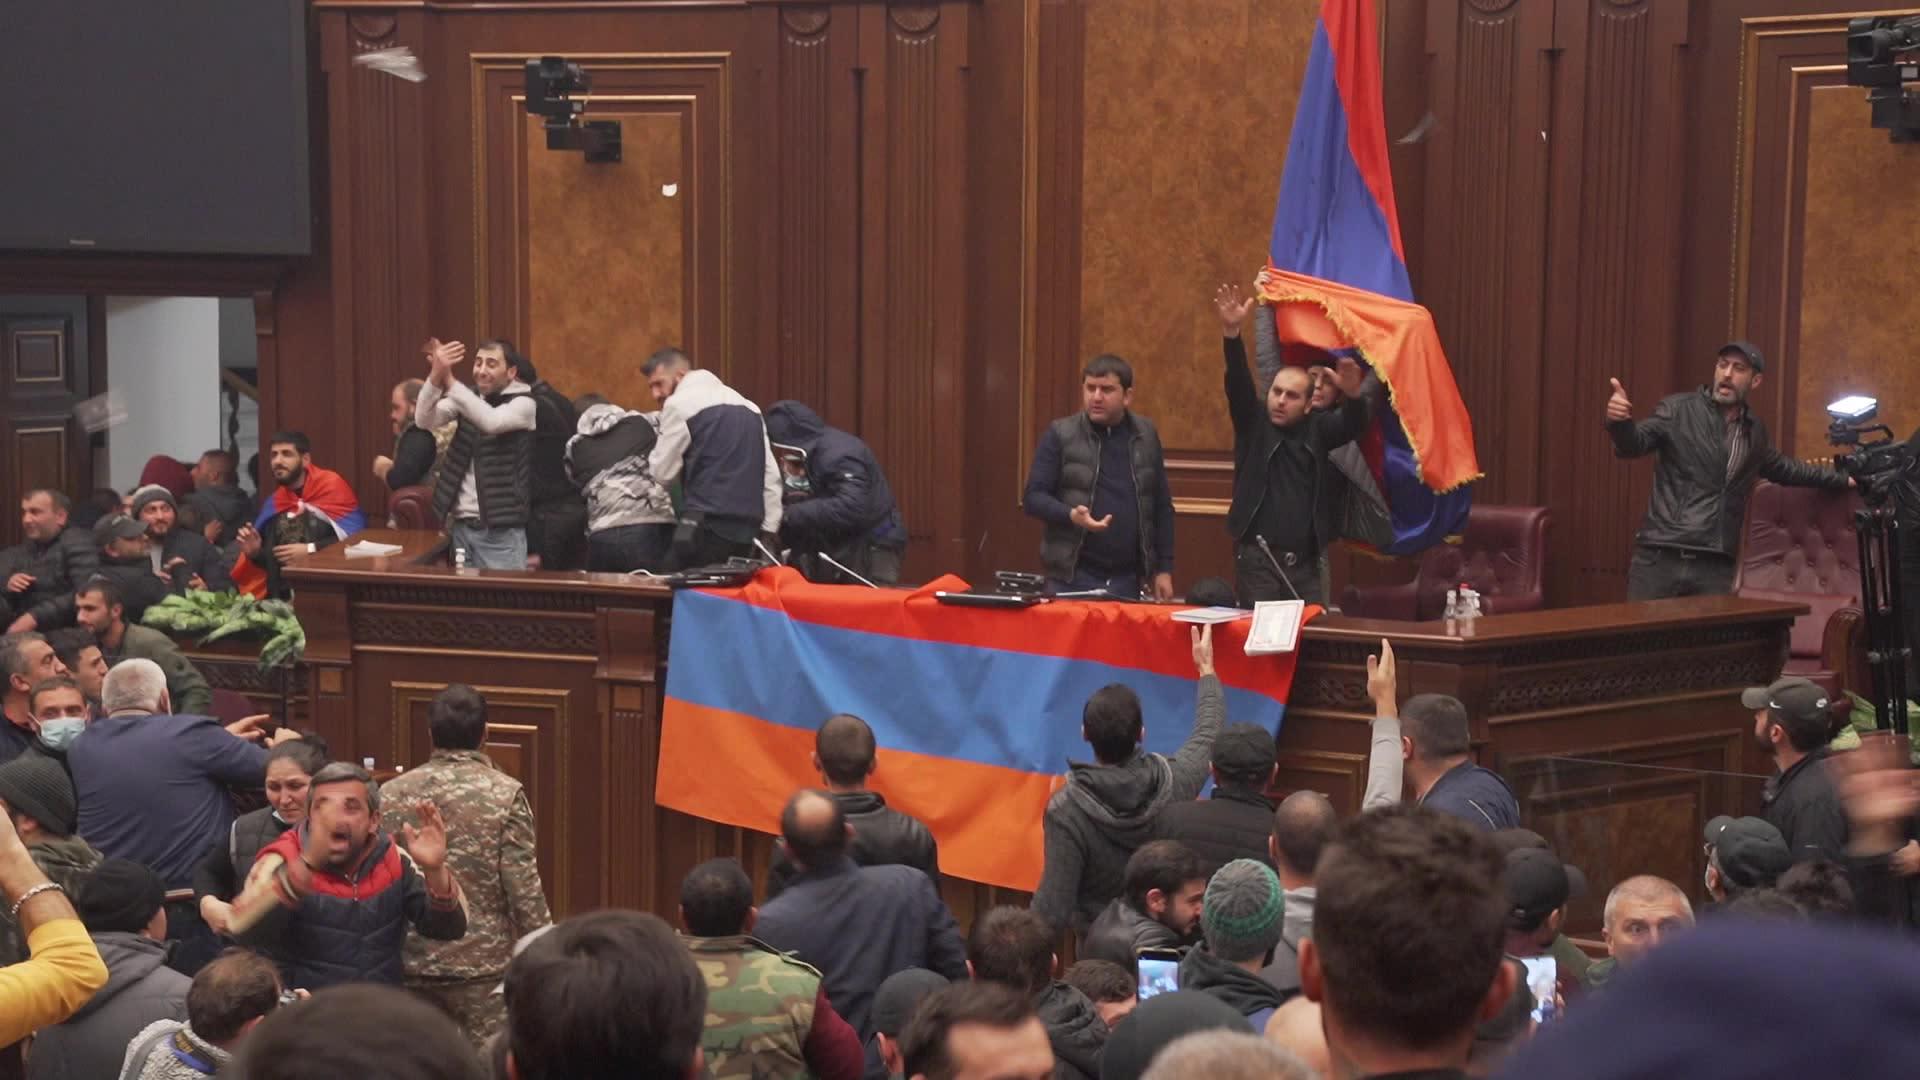 Chaos inside Armenia parliament as protesters denounce ceasefire